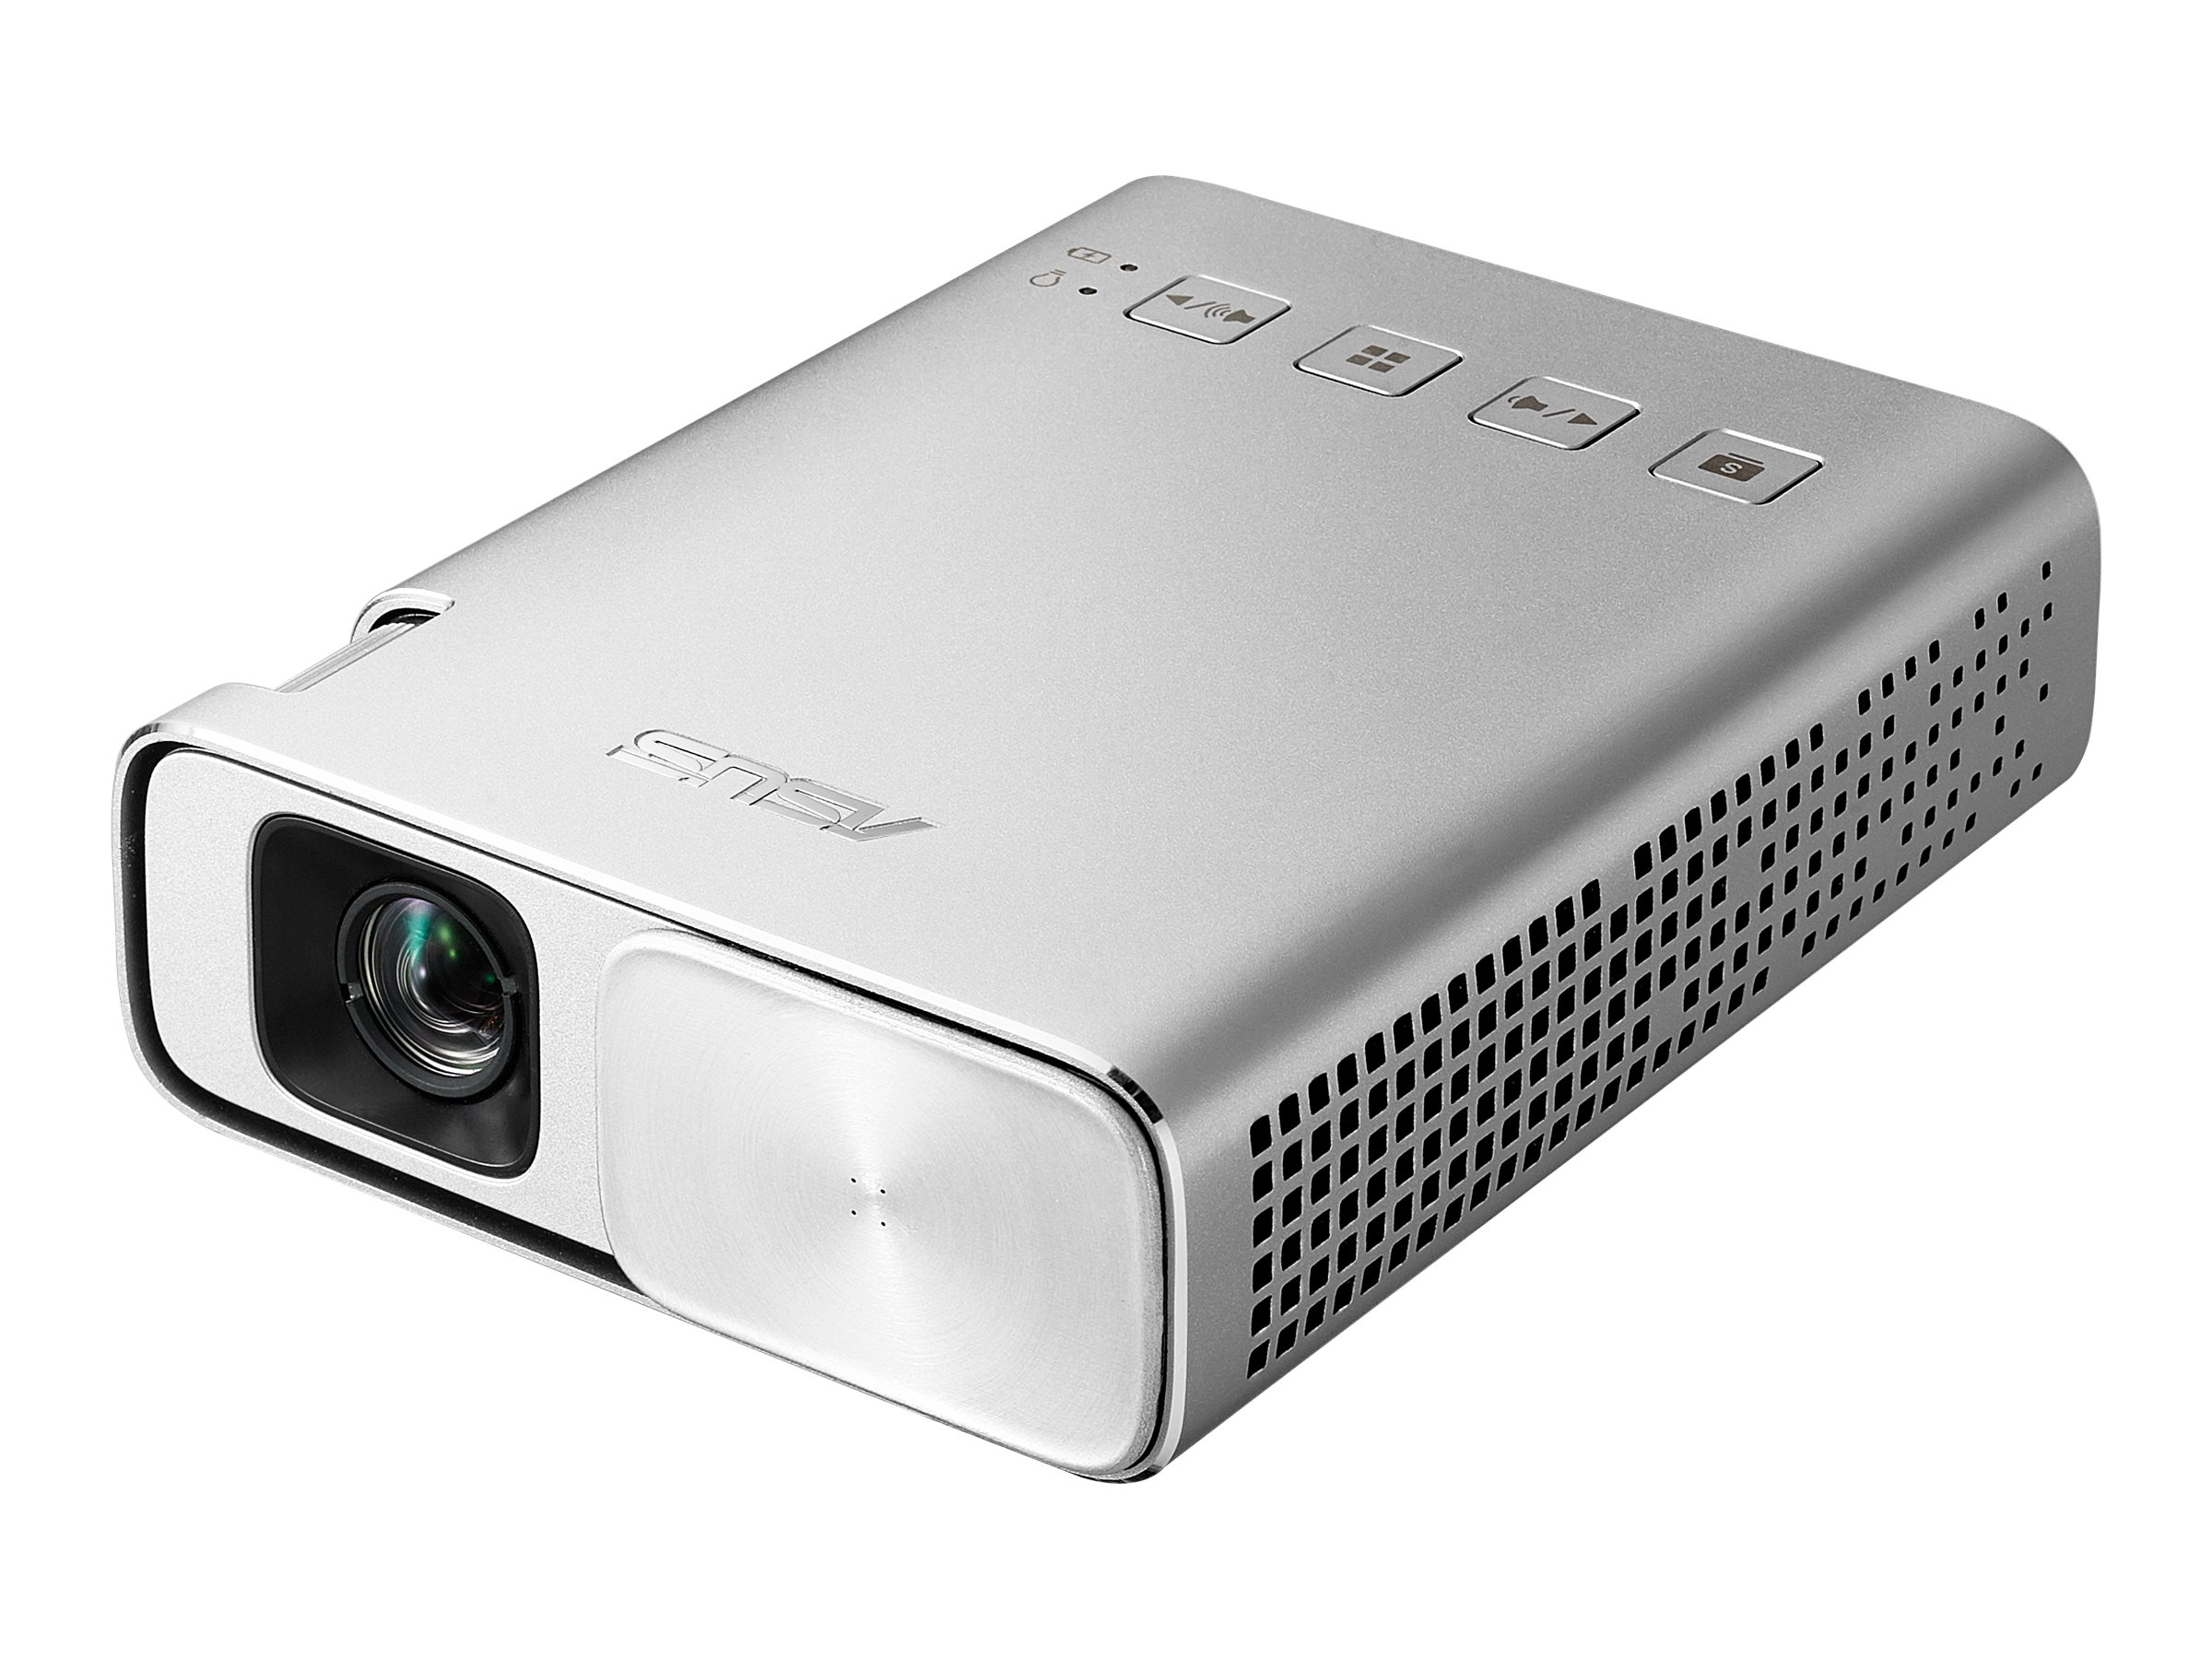 ASUS ZenBeam E1 - DLP-Projektor - RGB LED - 150 lm - WVGA (854 x 480)